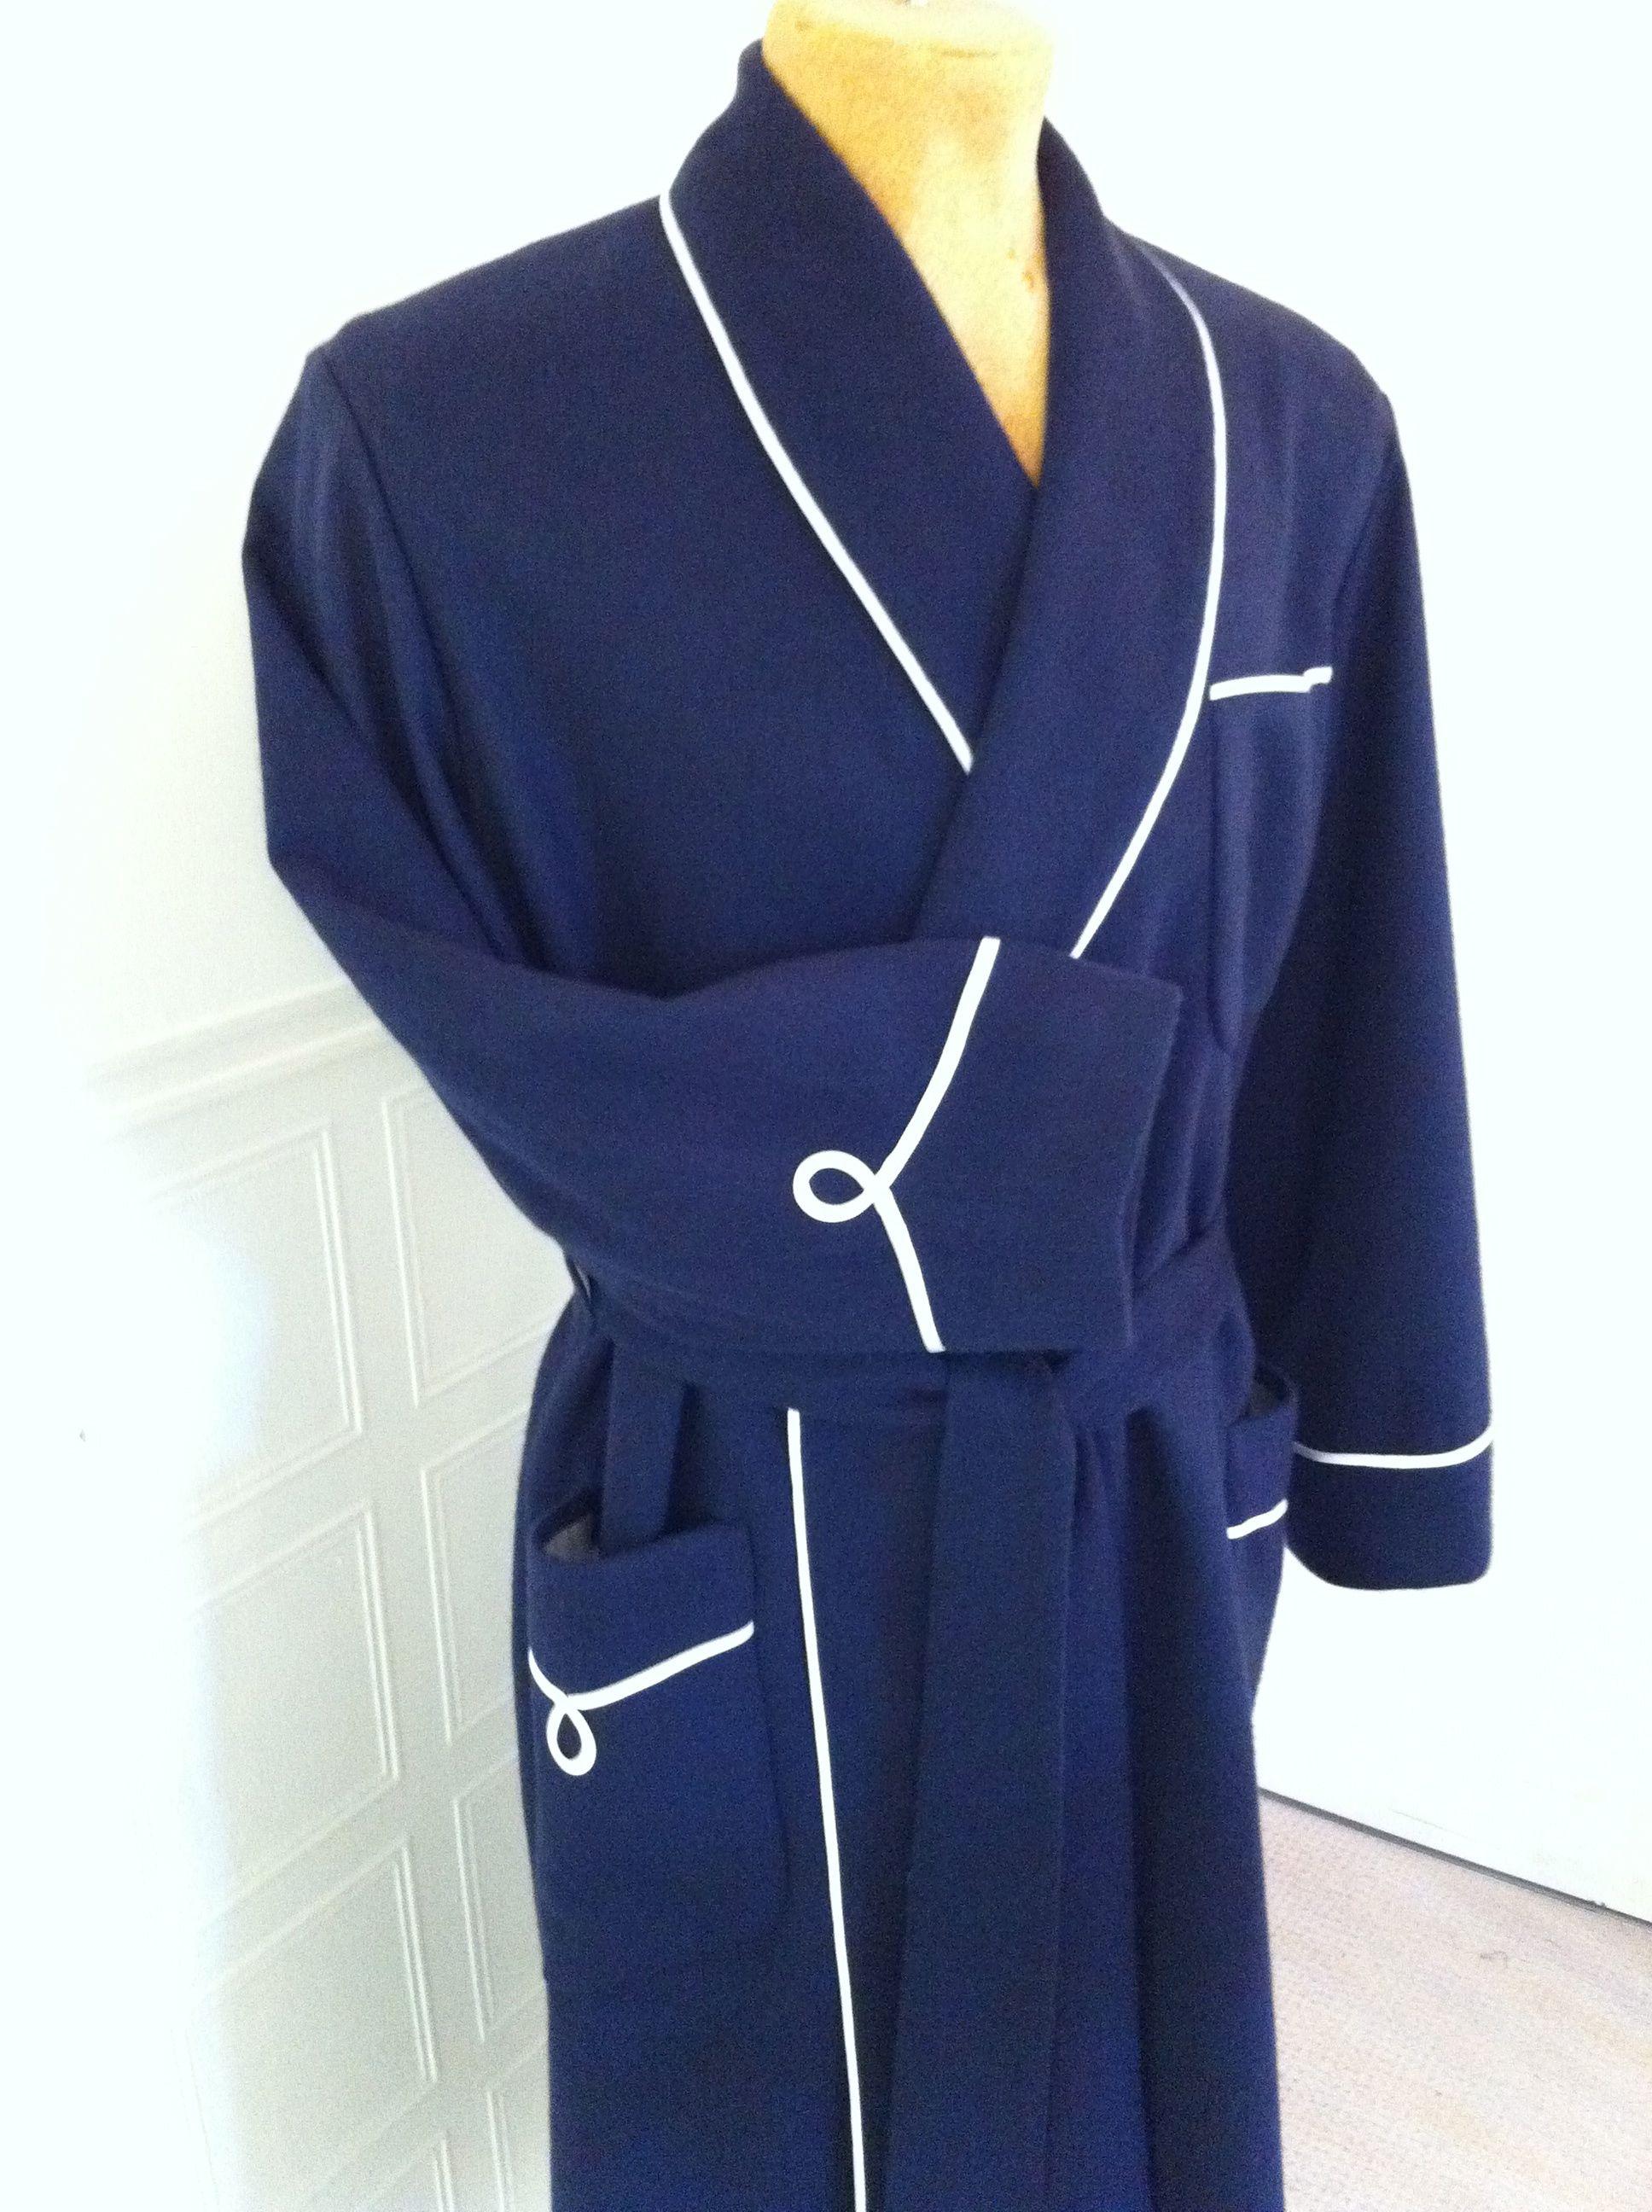 Daniel Hanson gowns | Daniel Hanson Dressing Gowns | Pinterest ...